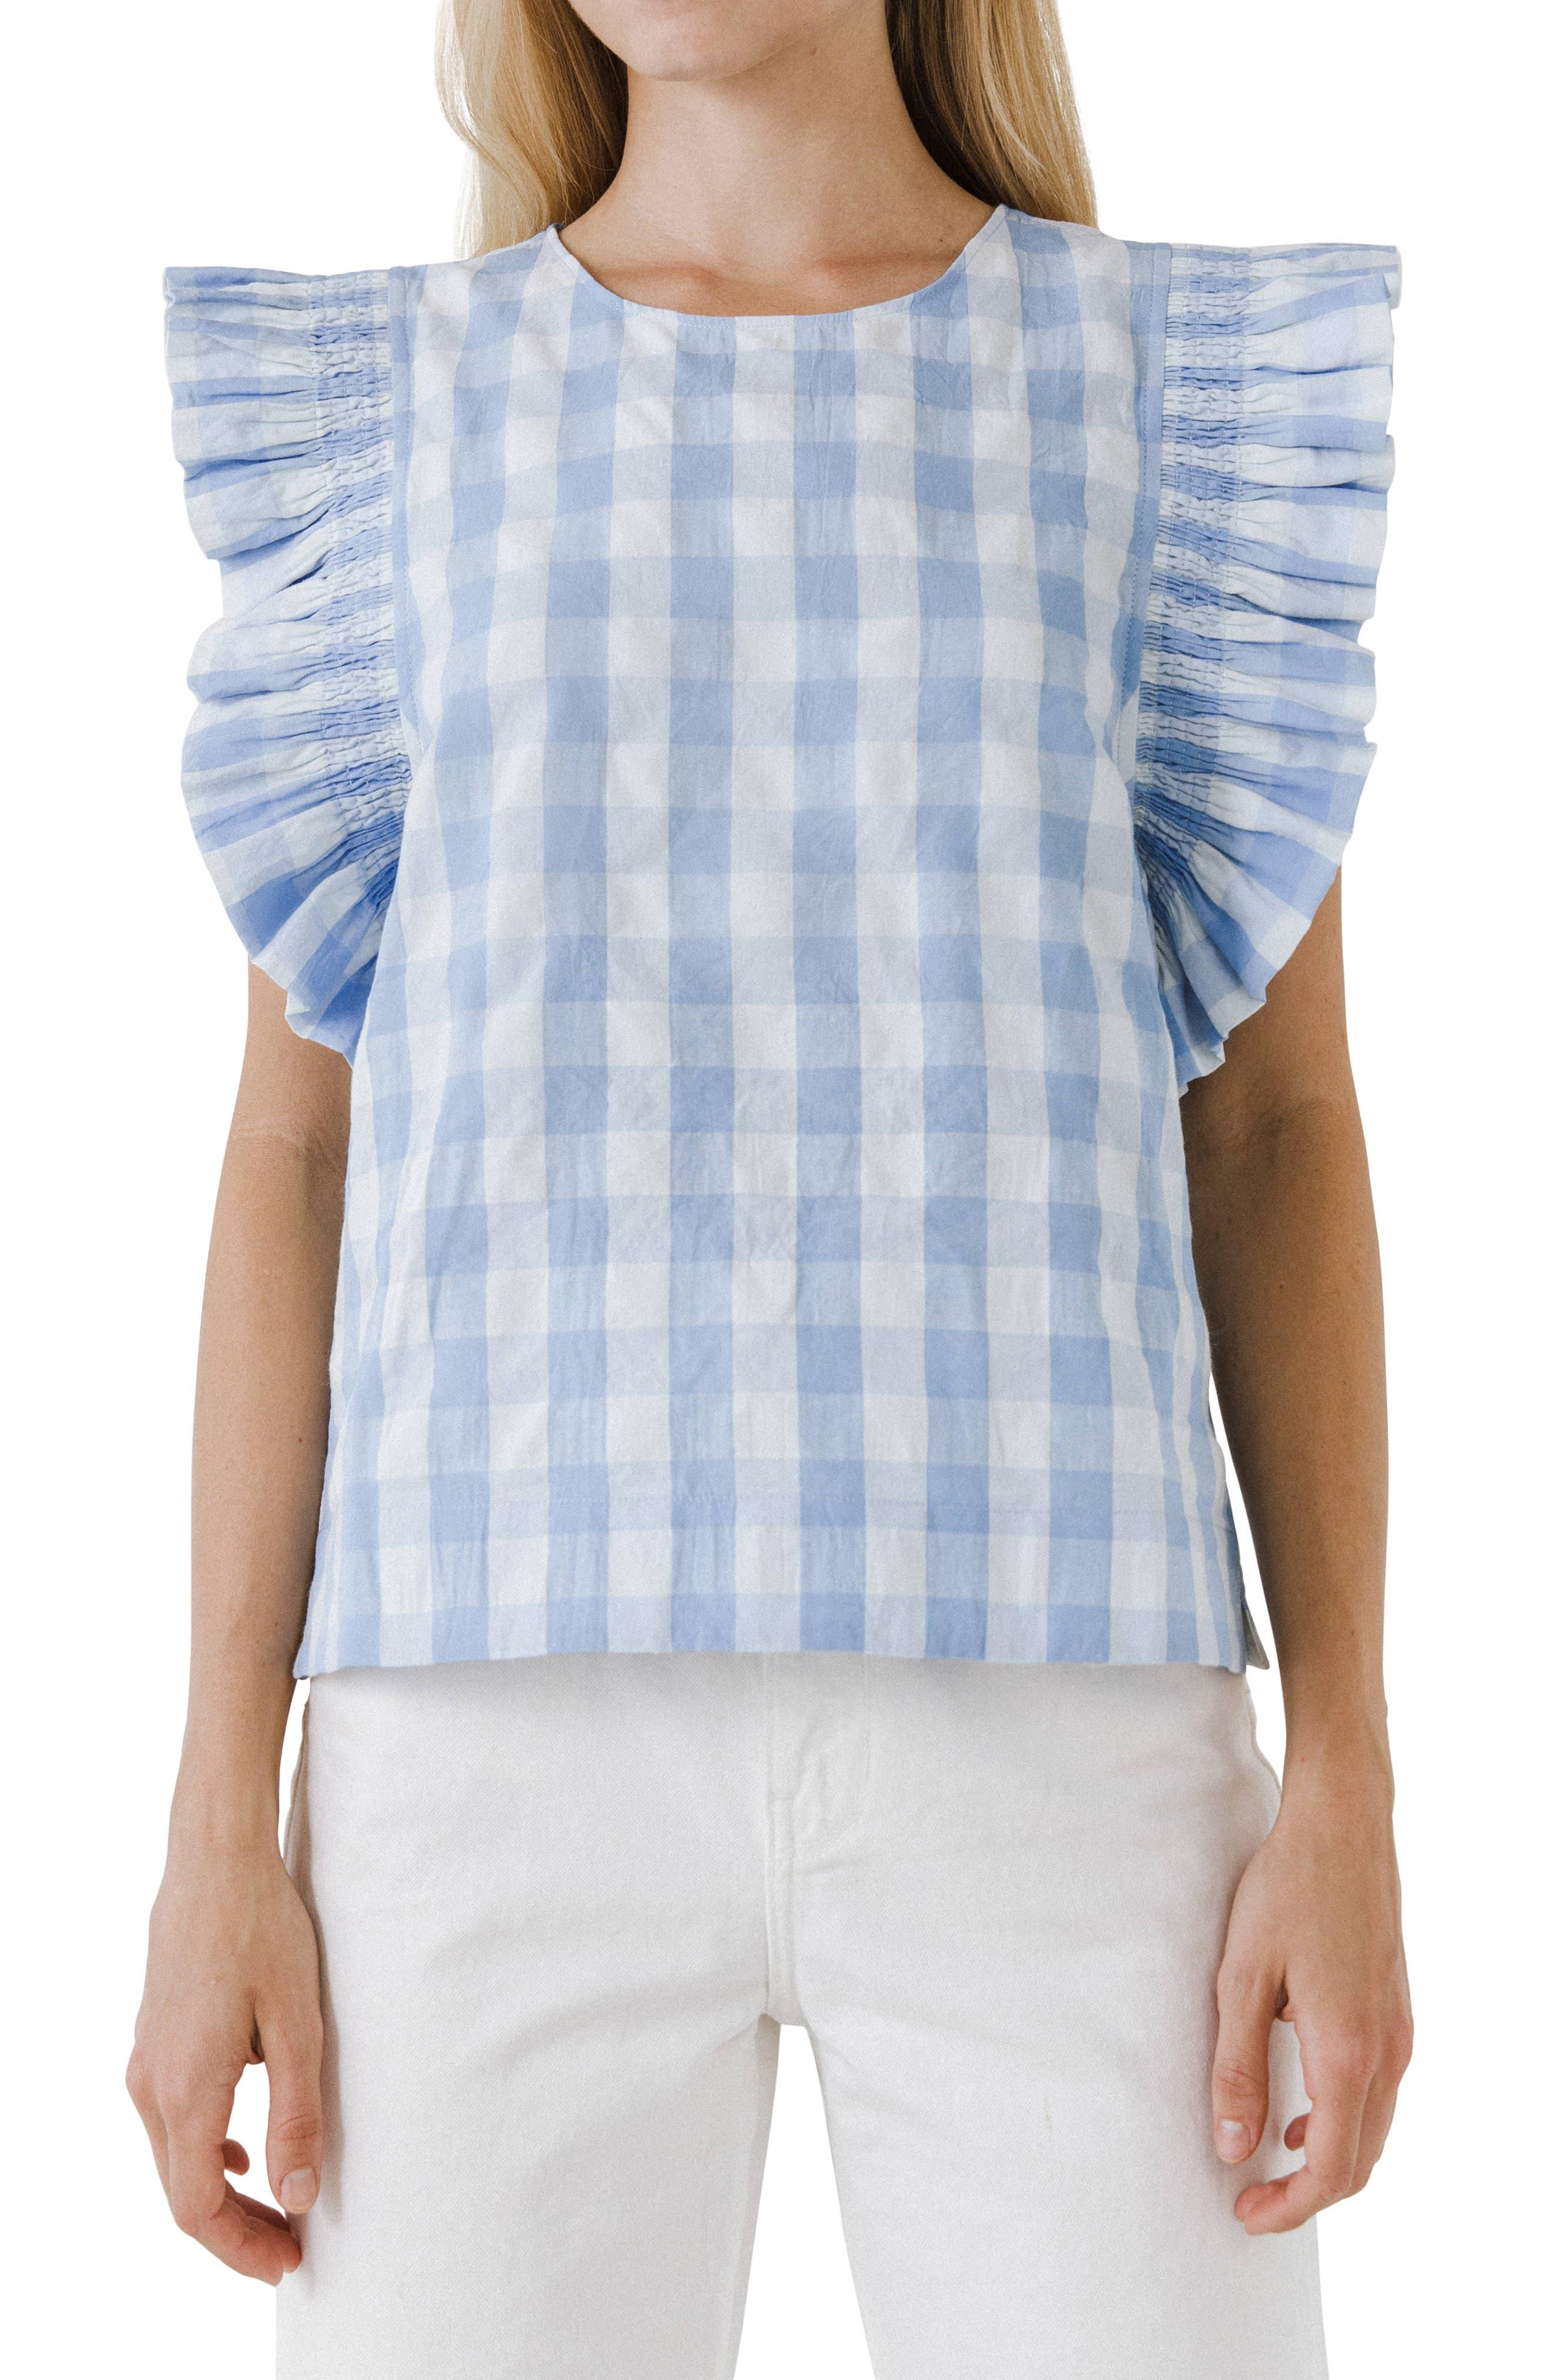 Gingham Ruffle Sleeve Top